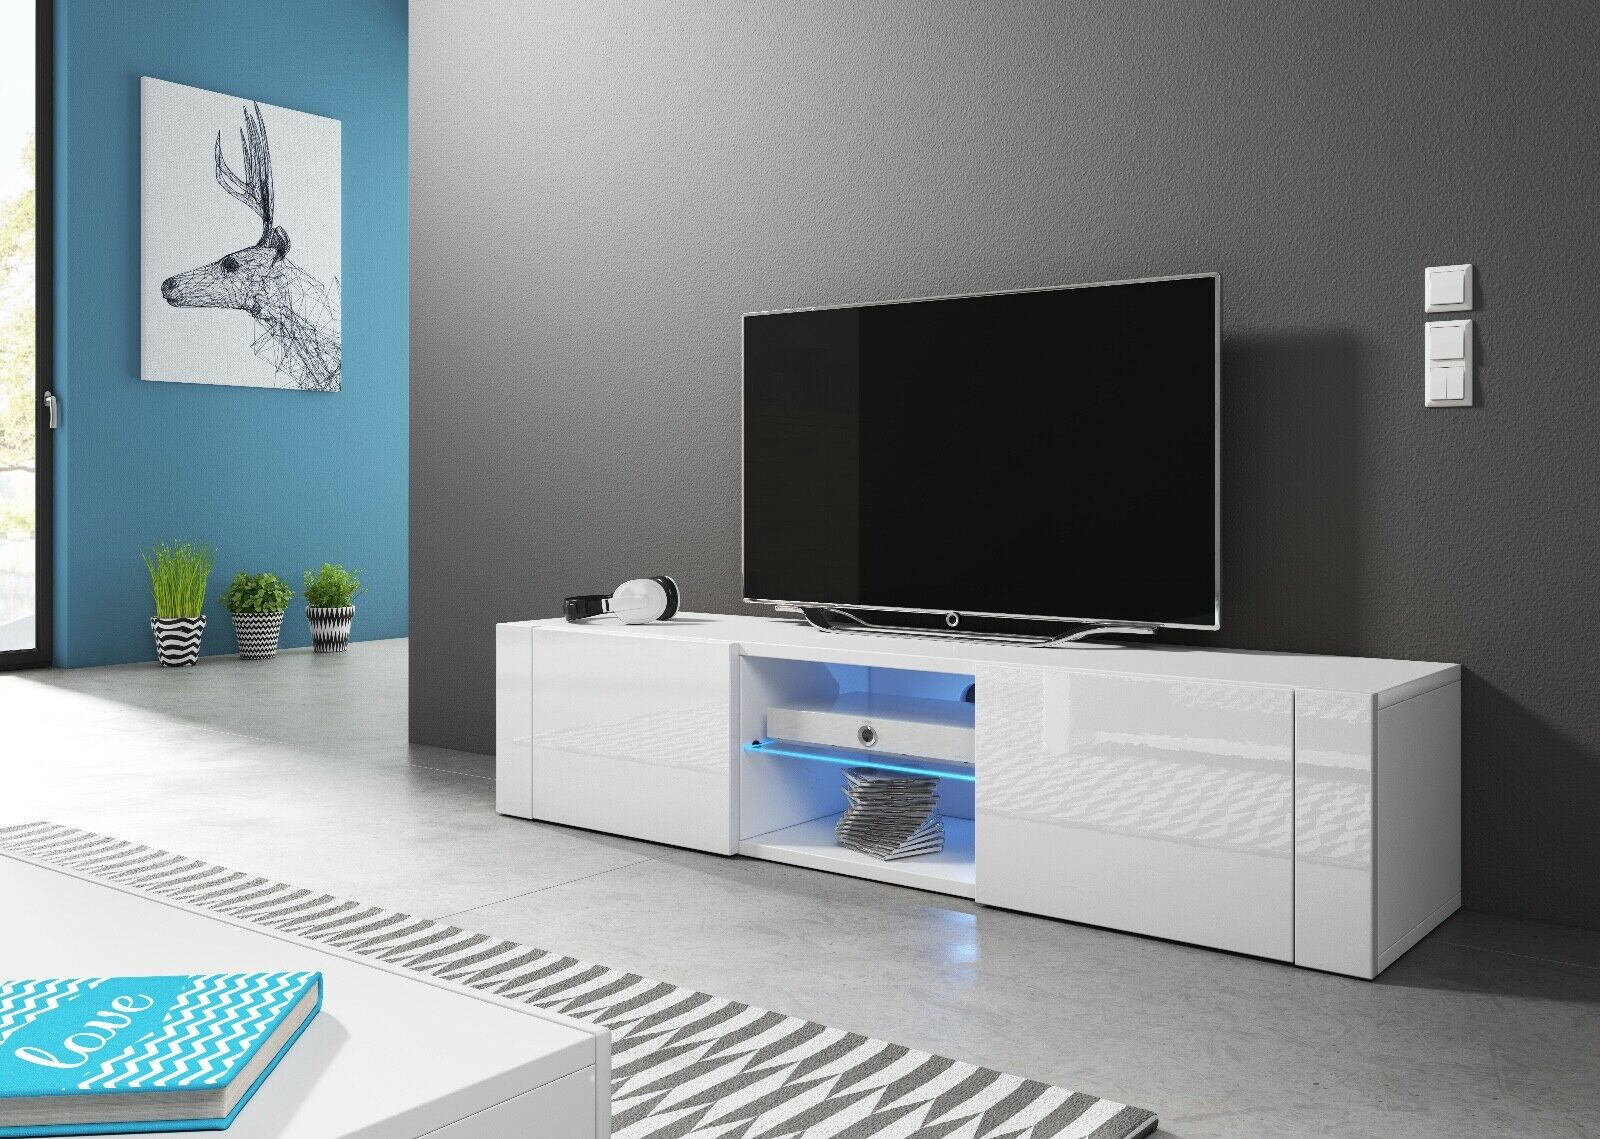 Sideboard Lowboard TV Fernsehschrank HIT 140 cm Kommode inkl LED Highboard NEU